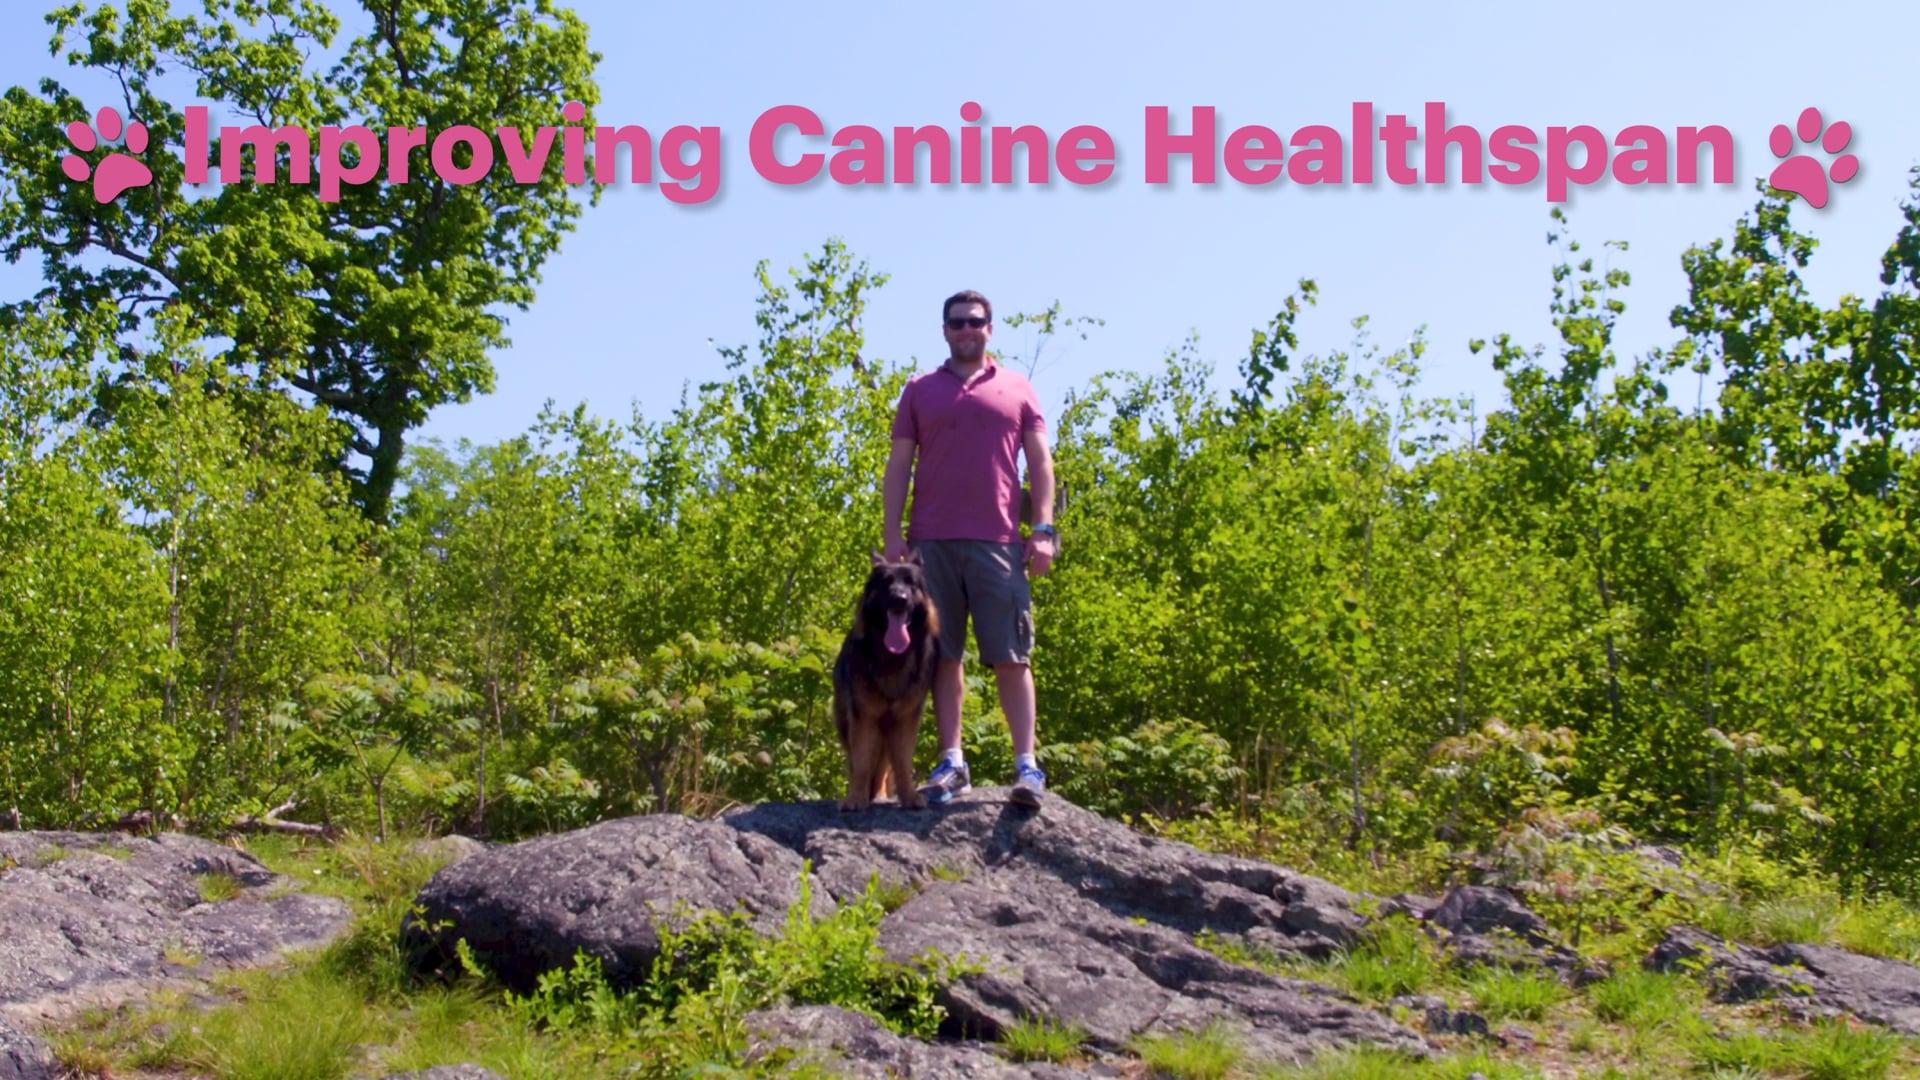 Improving Canine Healthspan